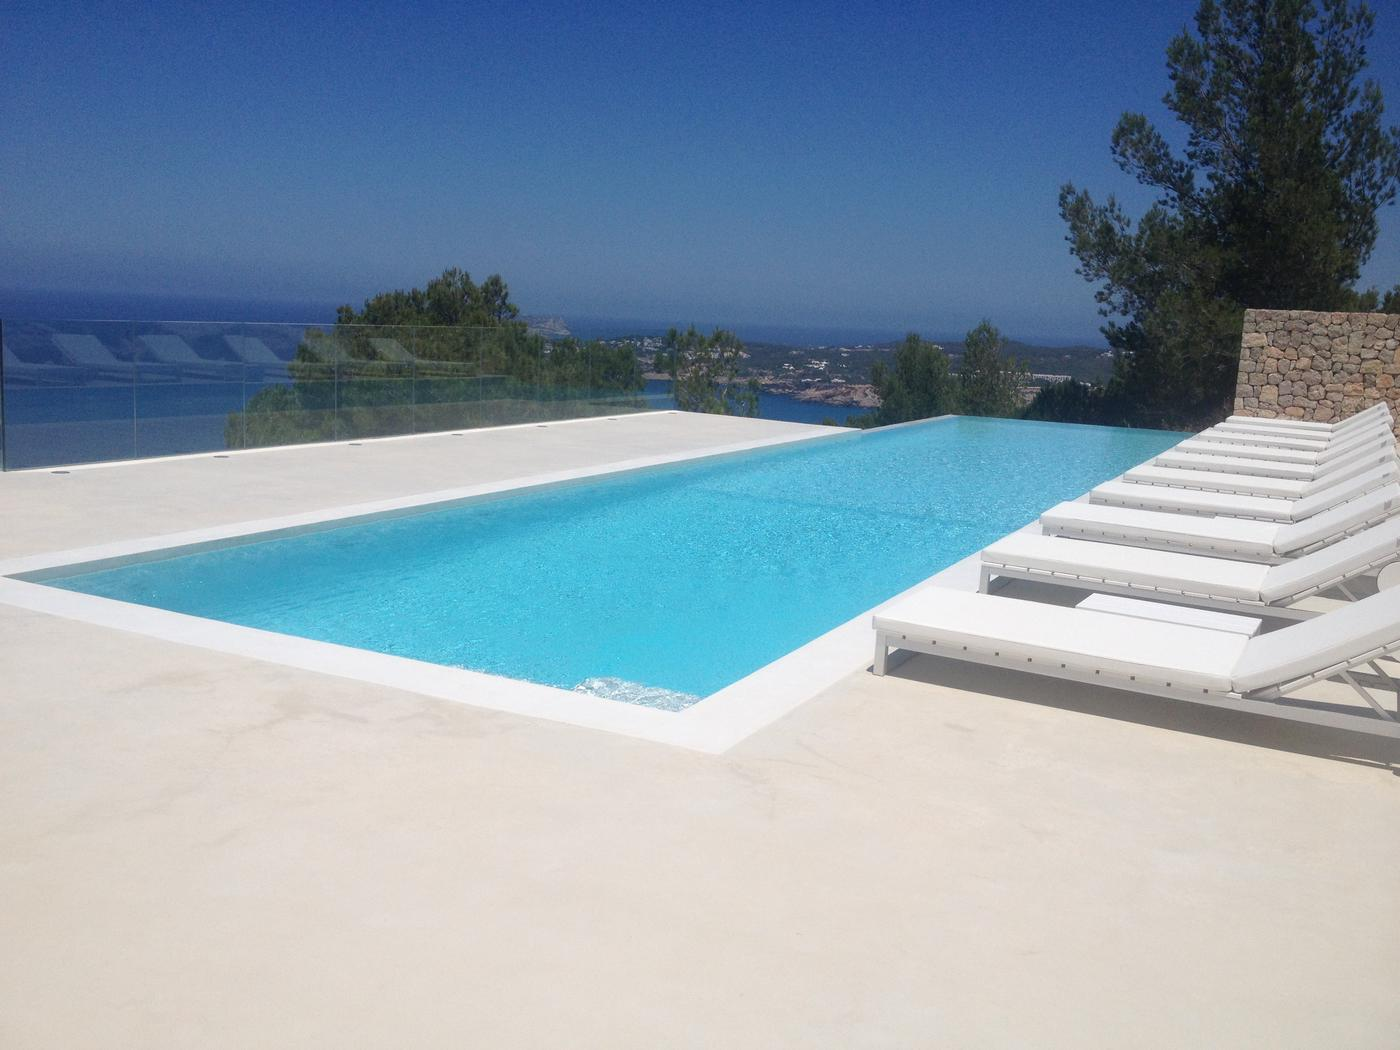 Terrasse piscine itauba for Construction piscine zyke